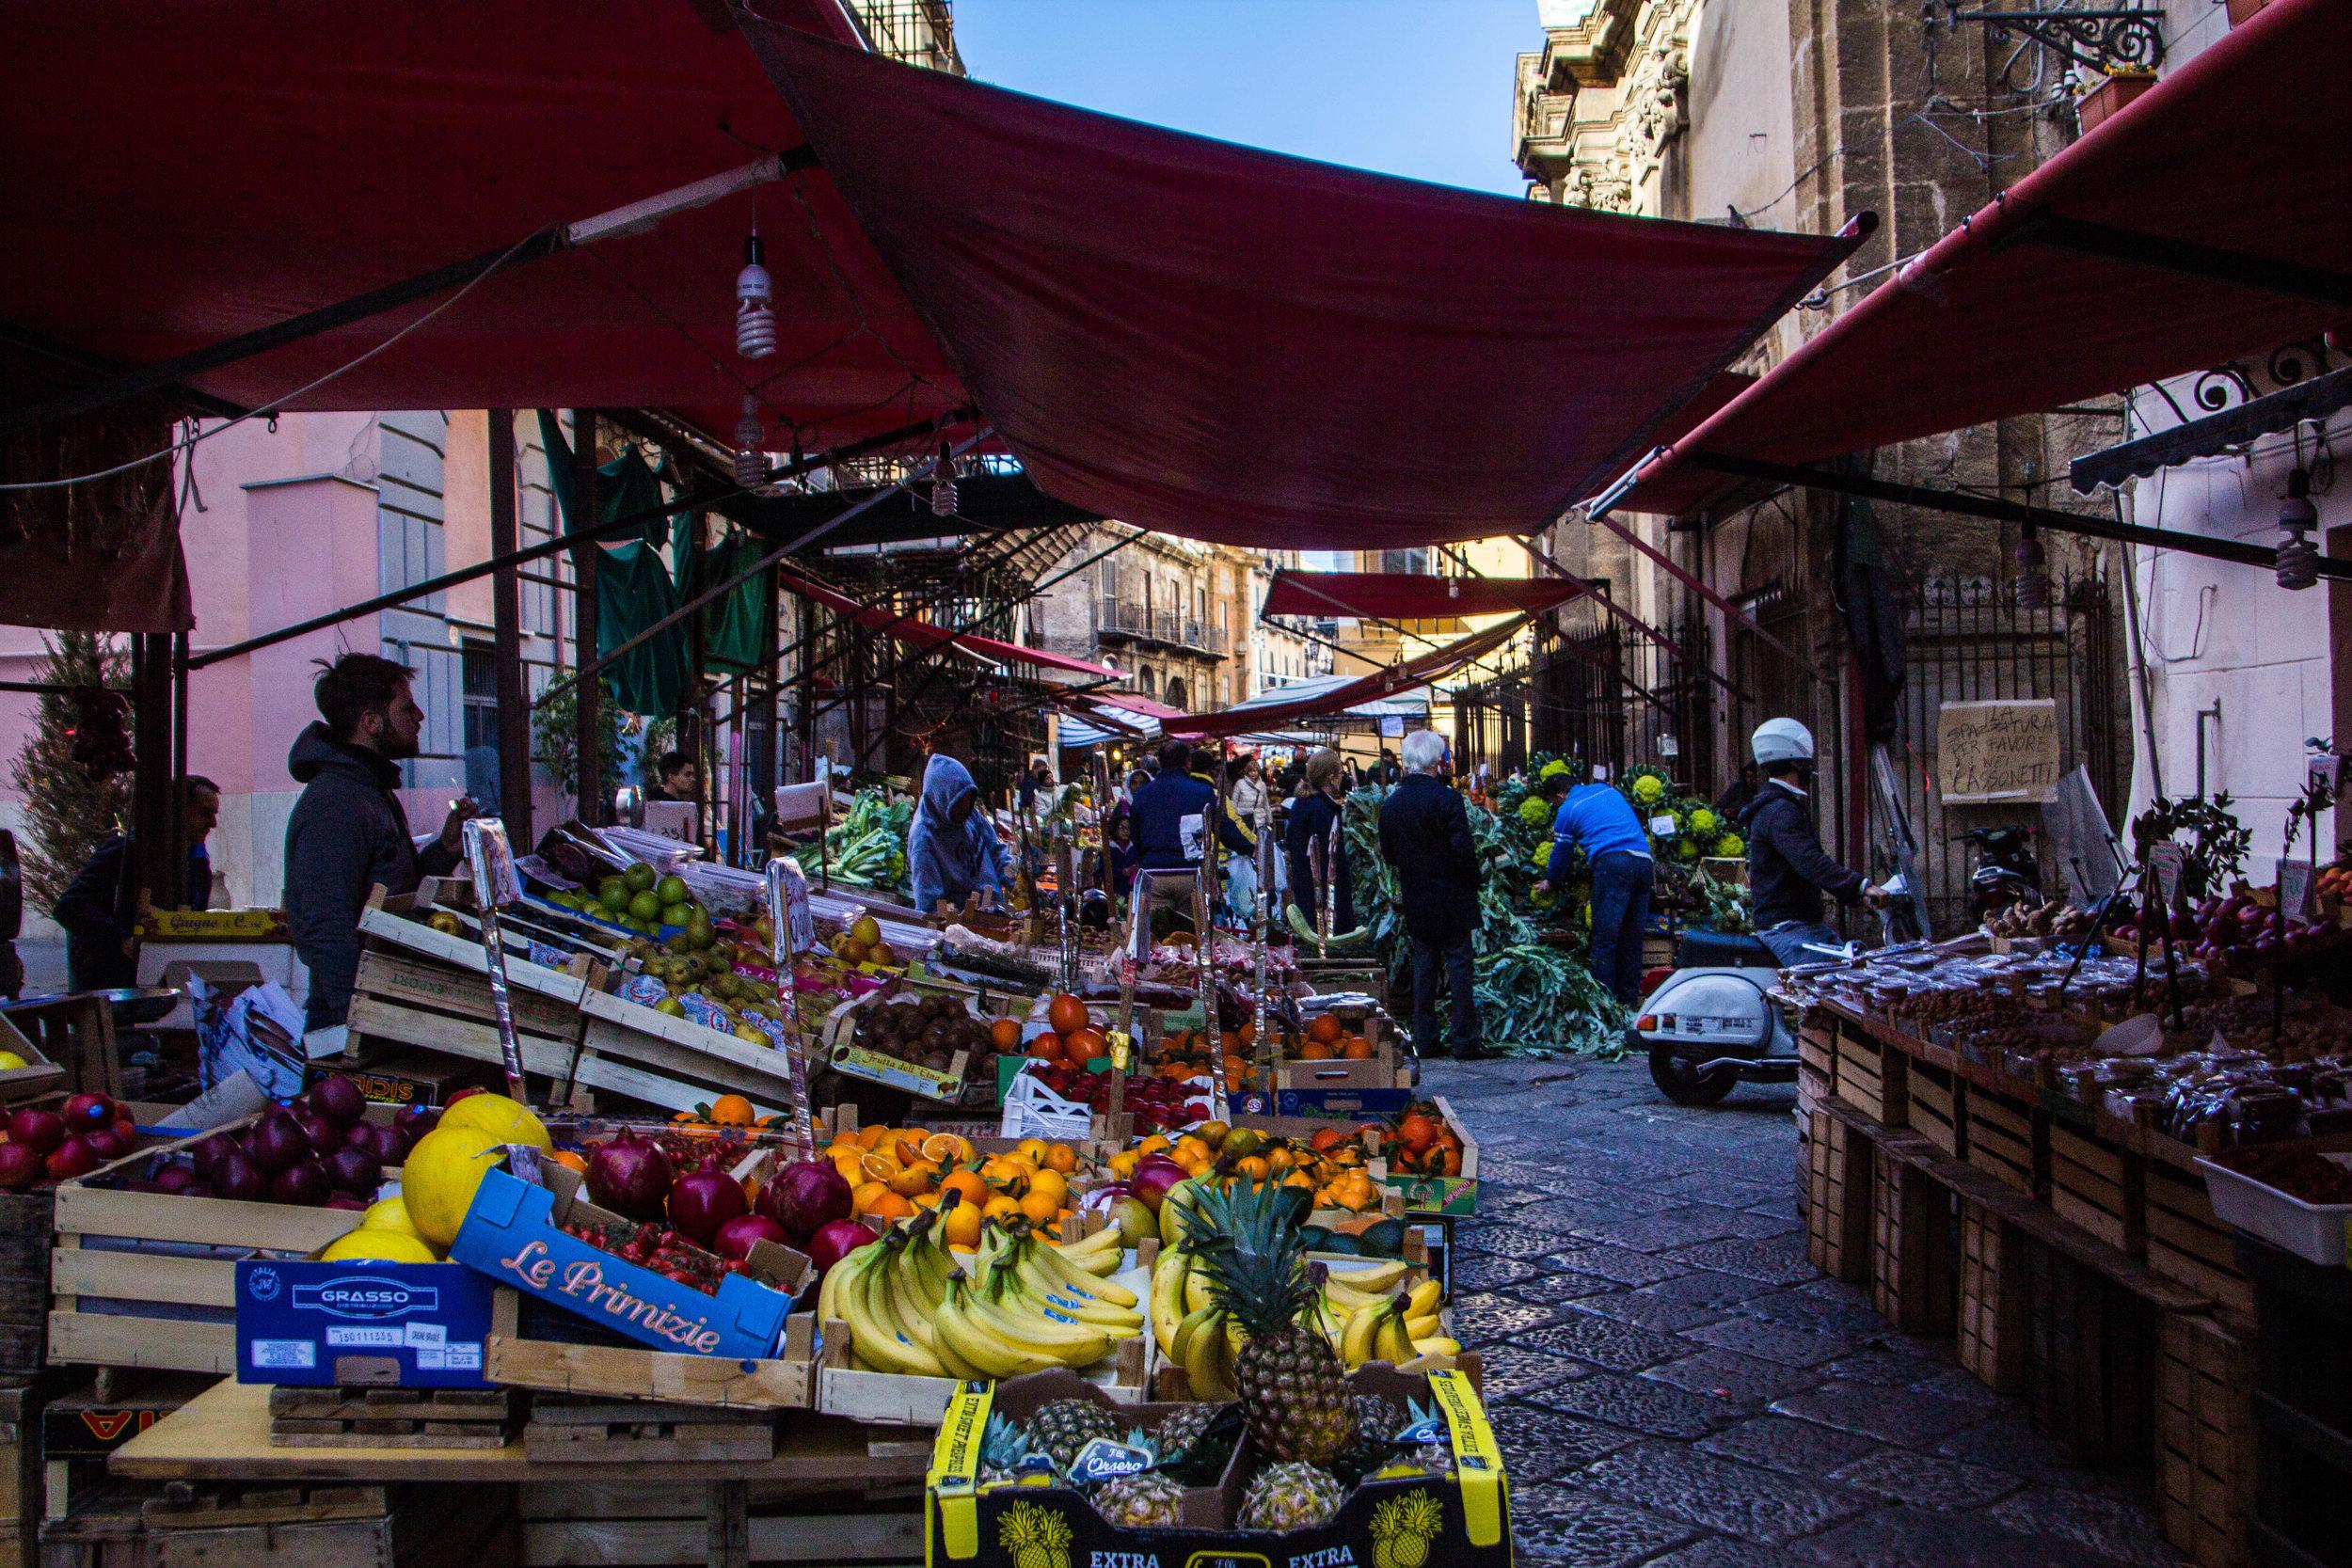 street-markets-palermo-sicily-16.jpg